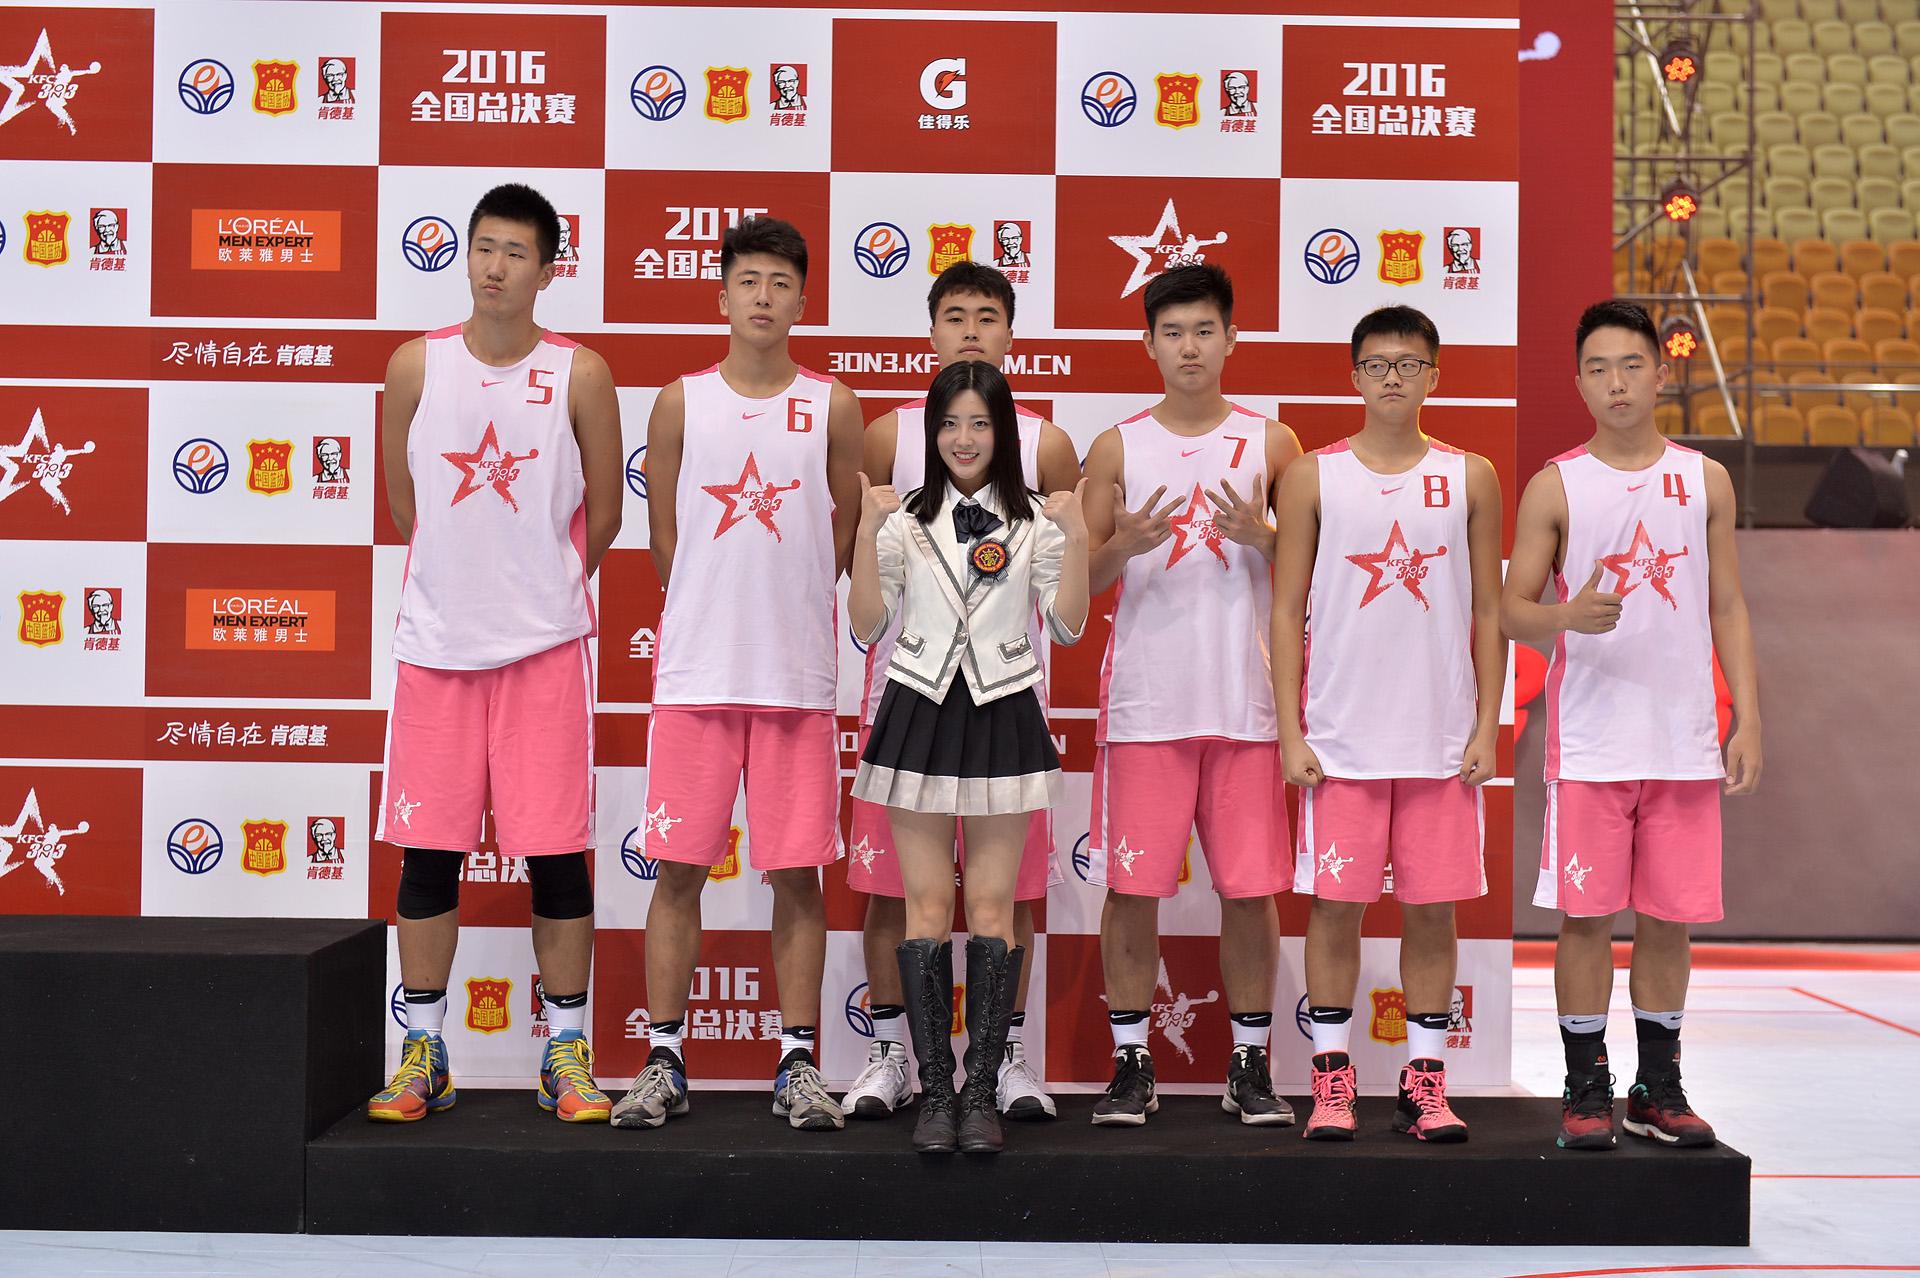 SNH48美少女变身篮球经理人 决战2016肯德基